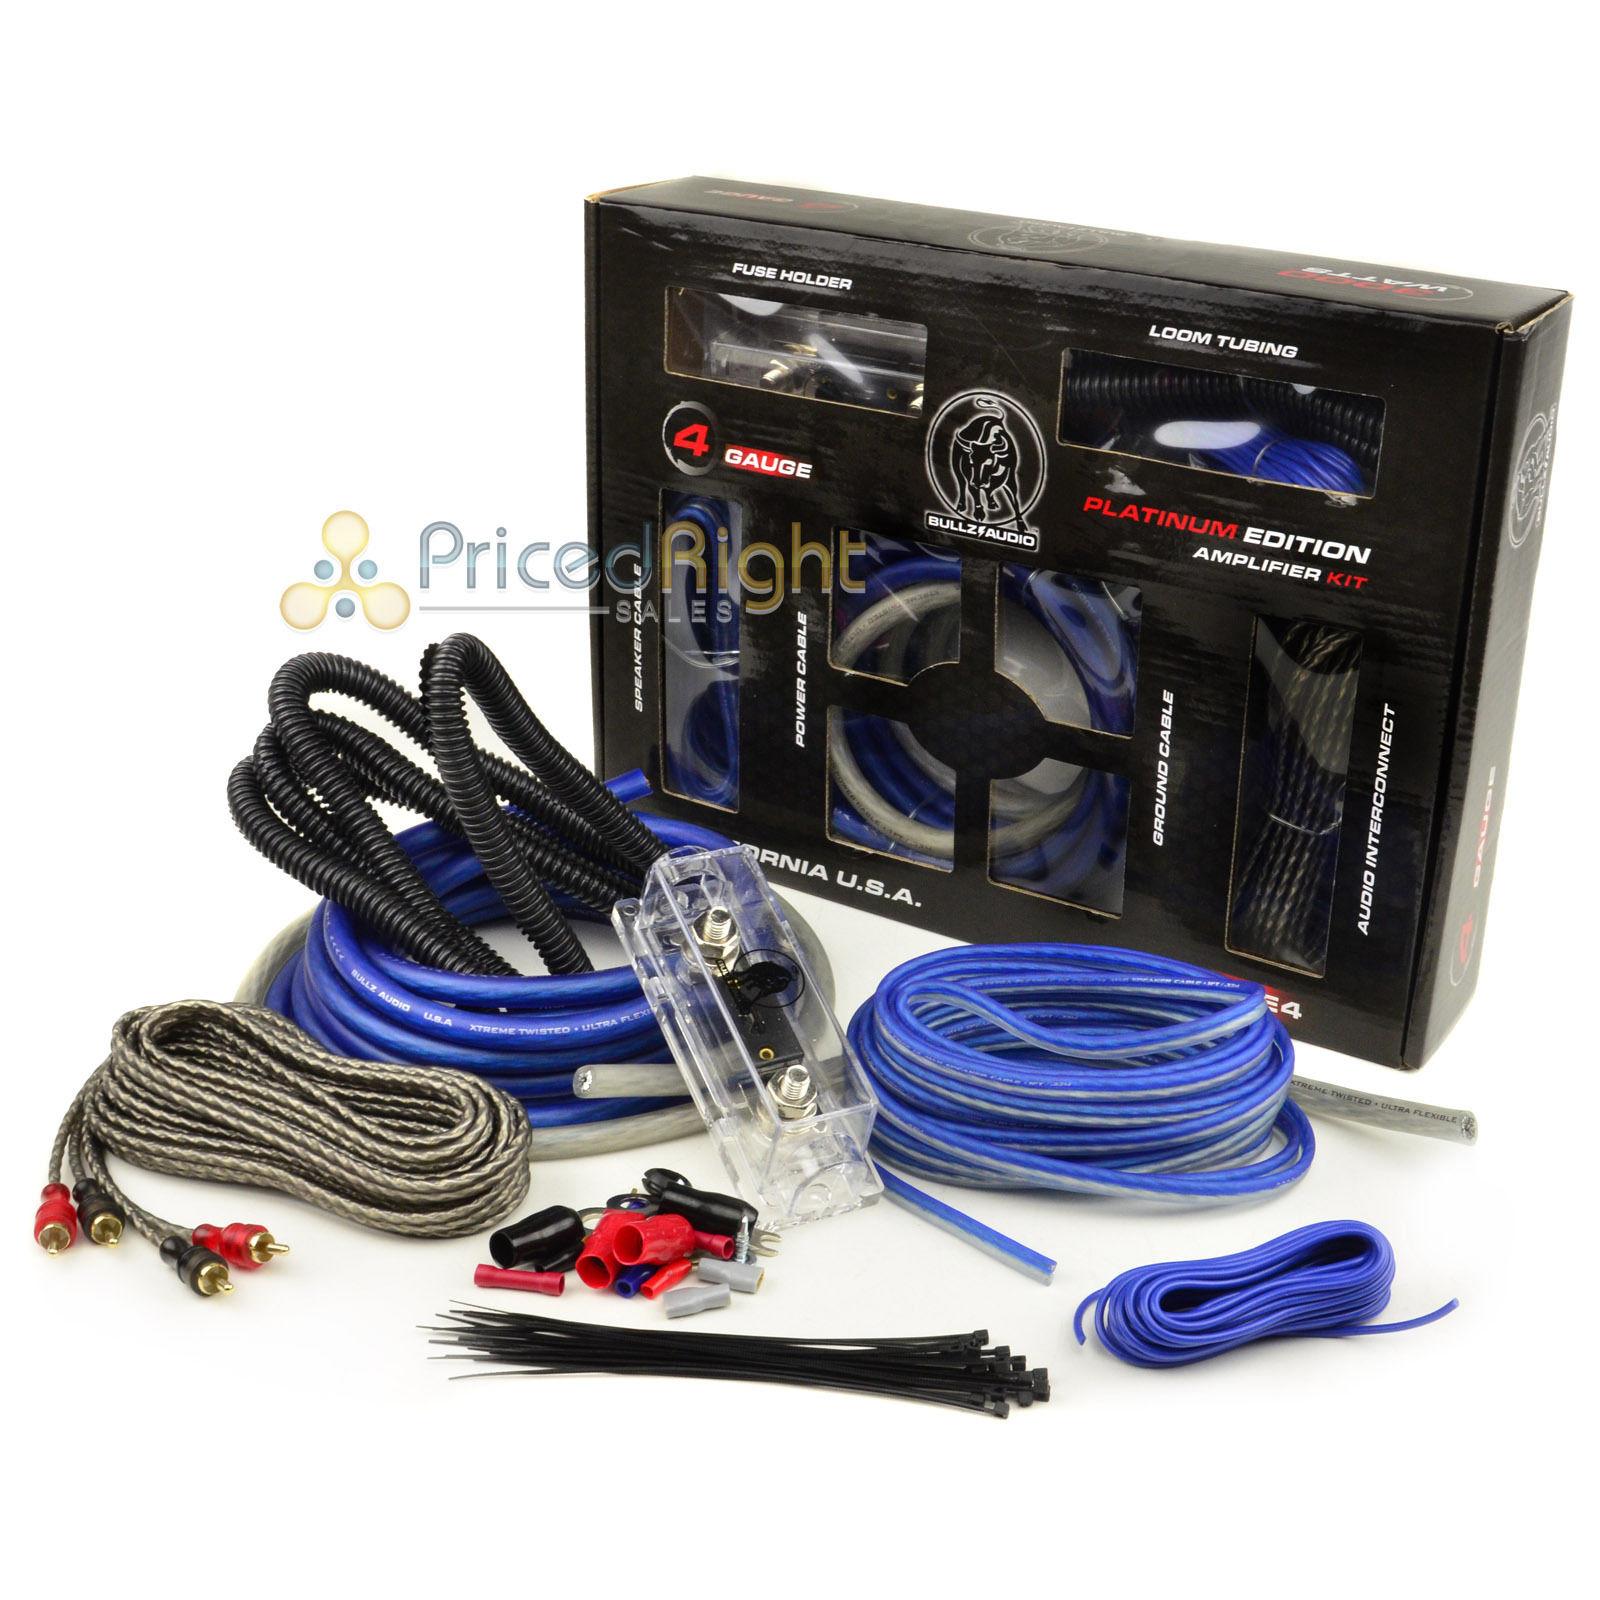 bullz car audio blue 4 gauge pro amp amplifier power wiring kit rh ebay com